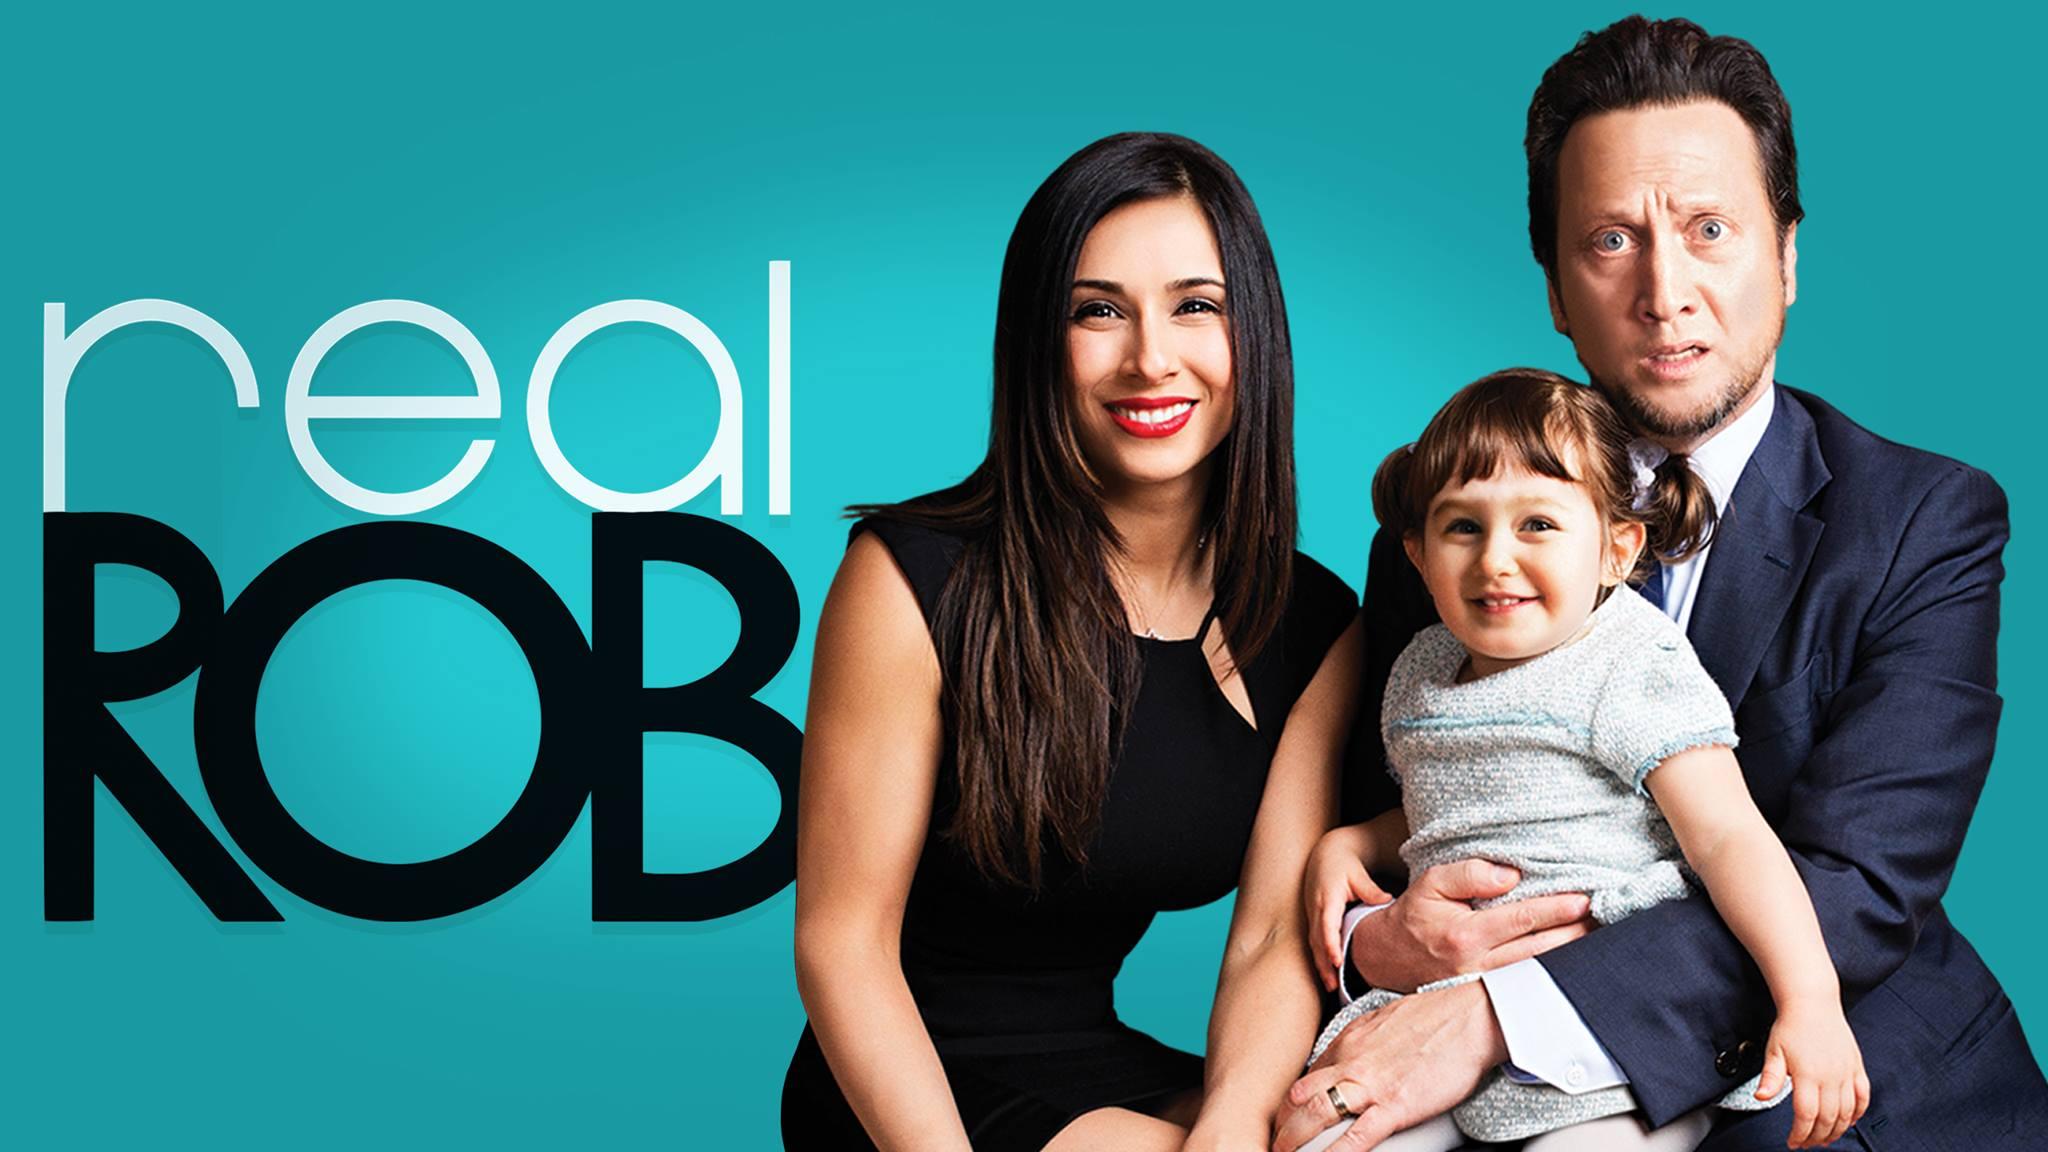 Real Rob season 3